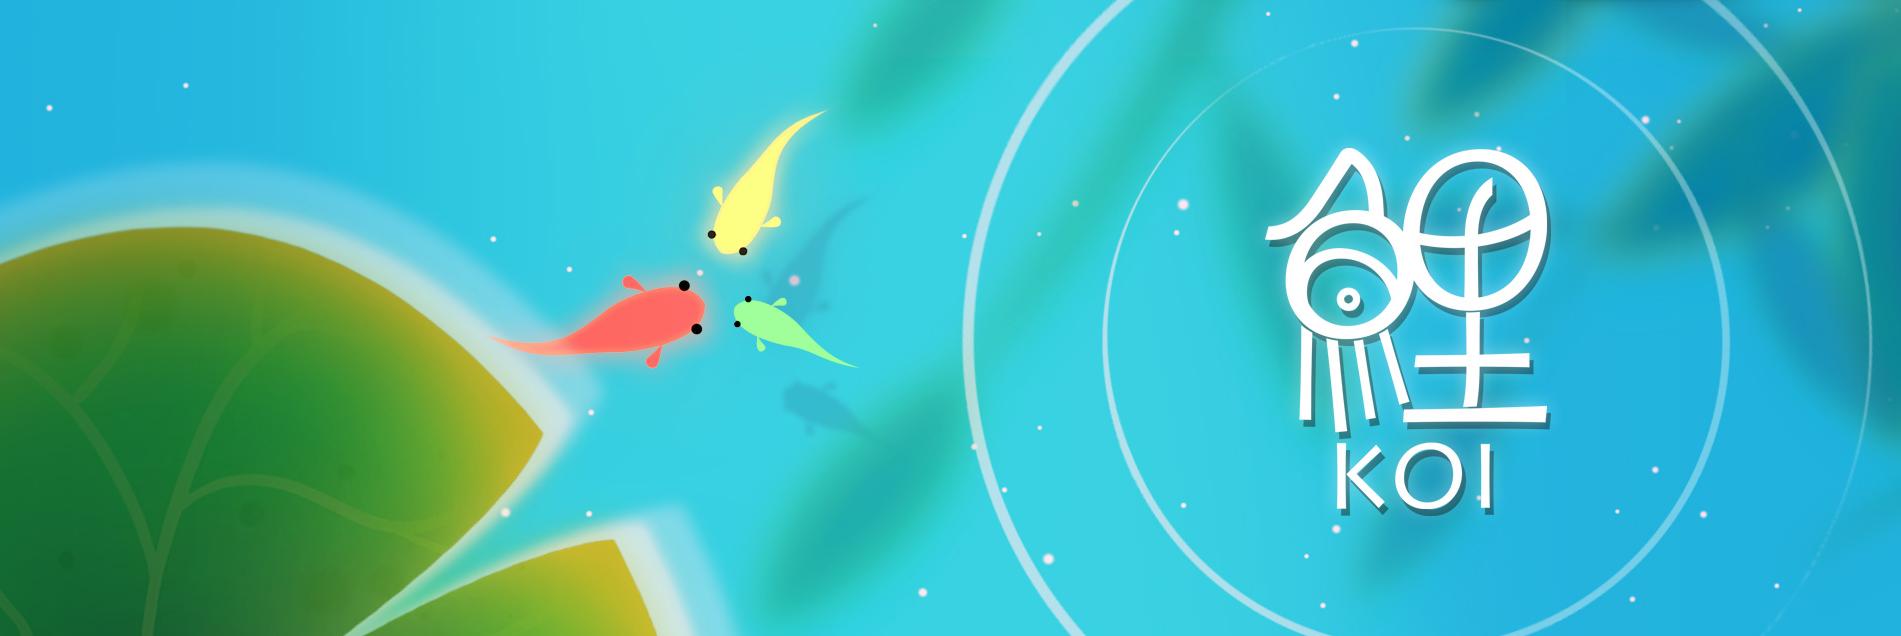 Koi ps4 ps4 game mod db for Koi fish games